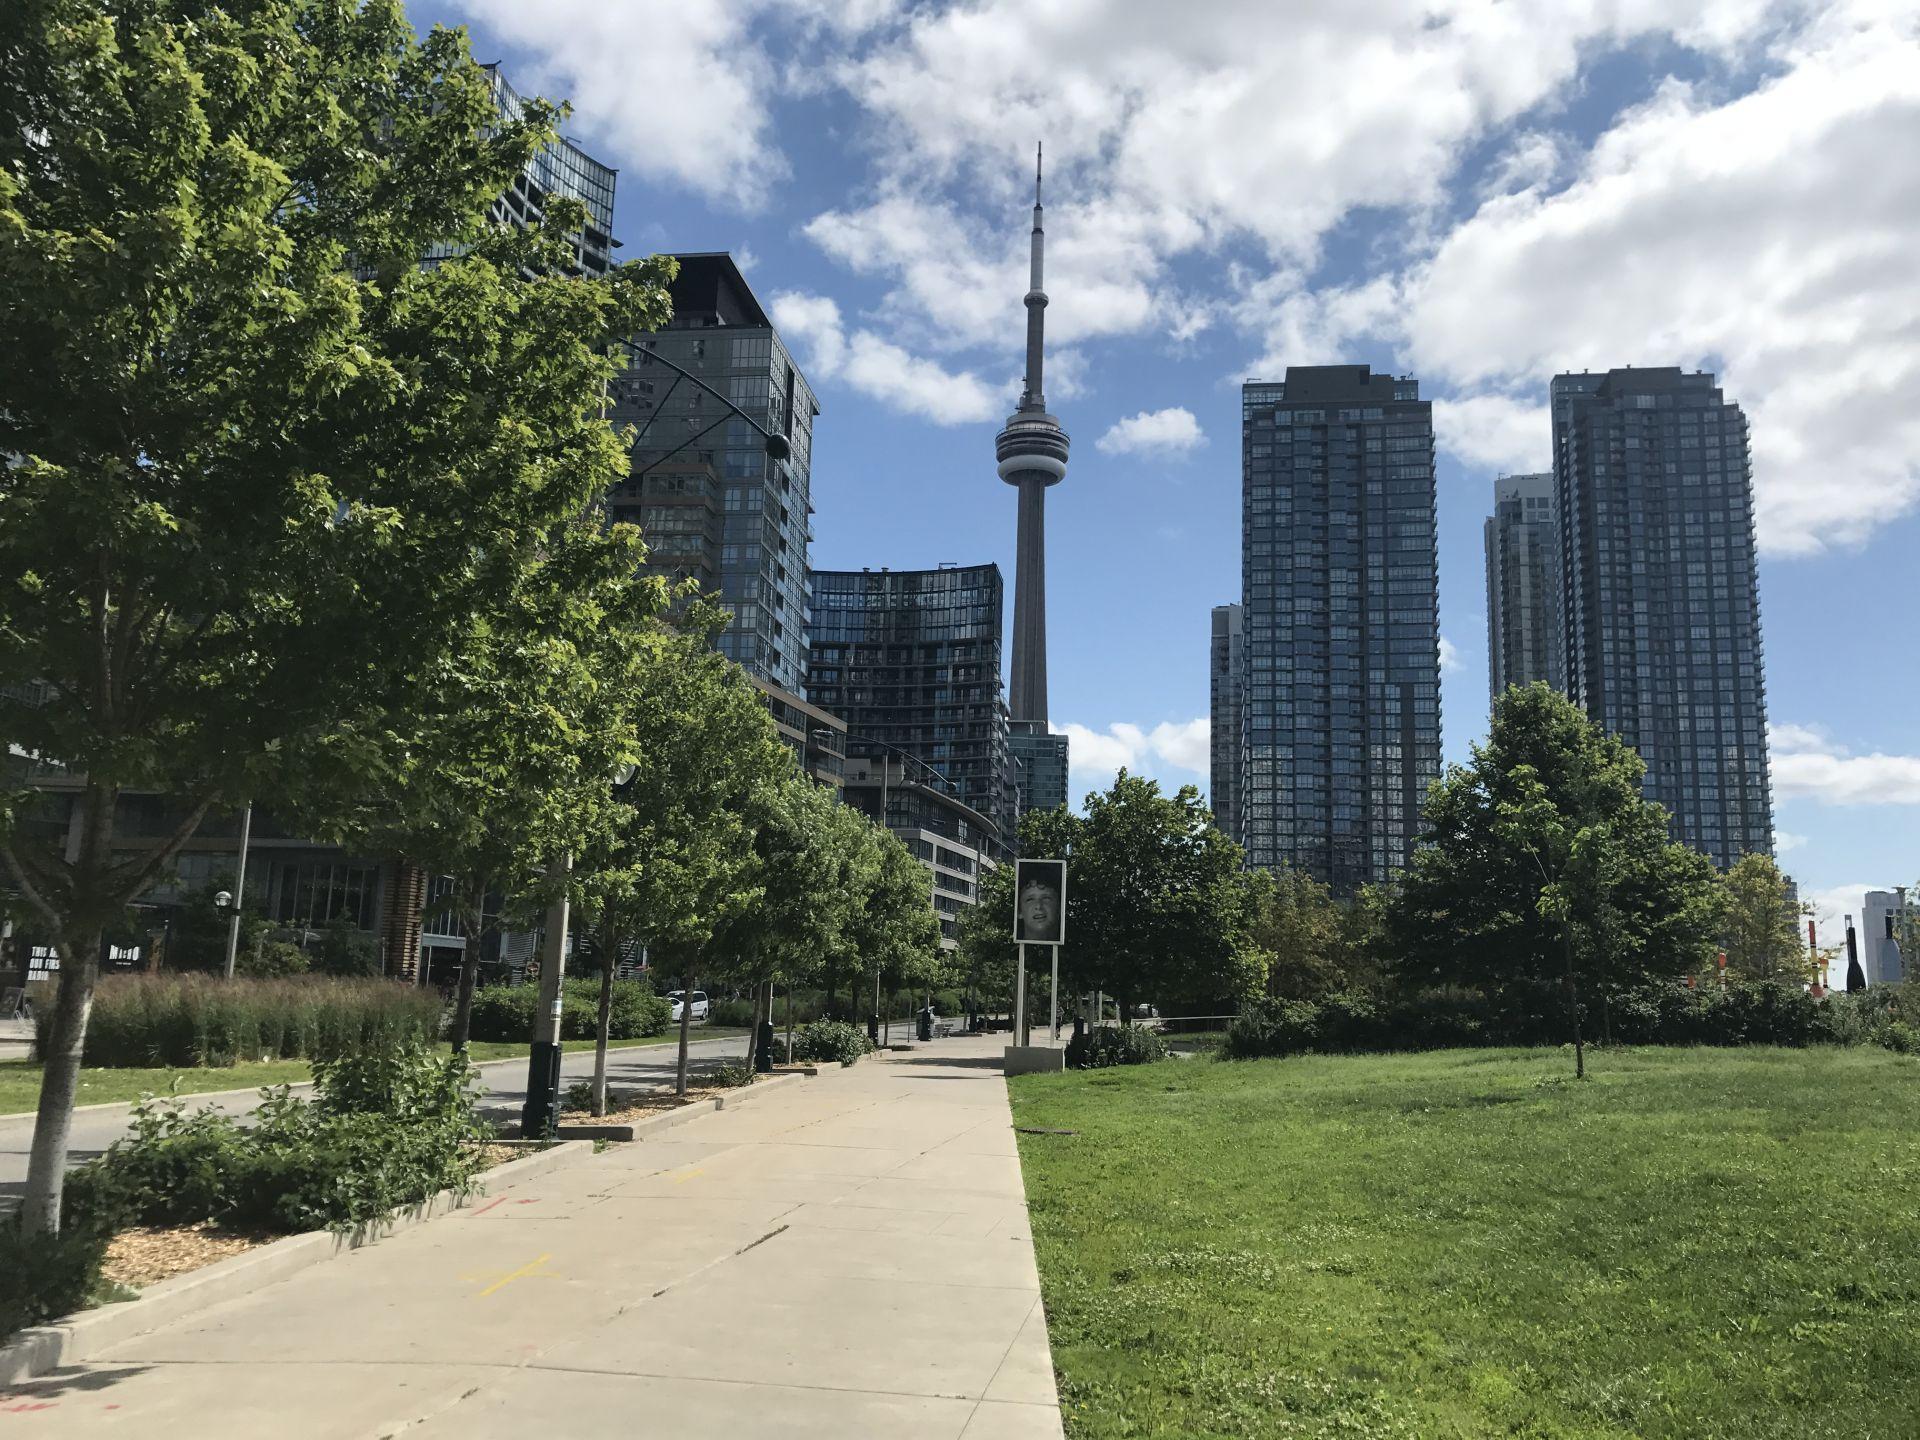 park v centru toronto s vyhledem na cn tower